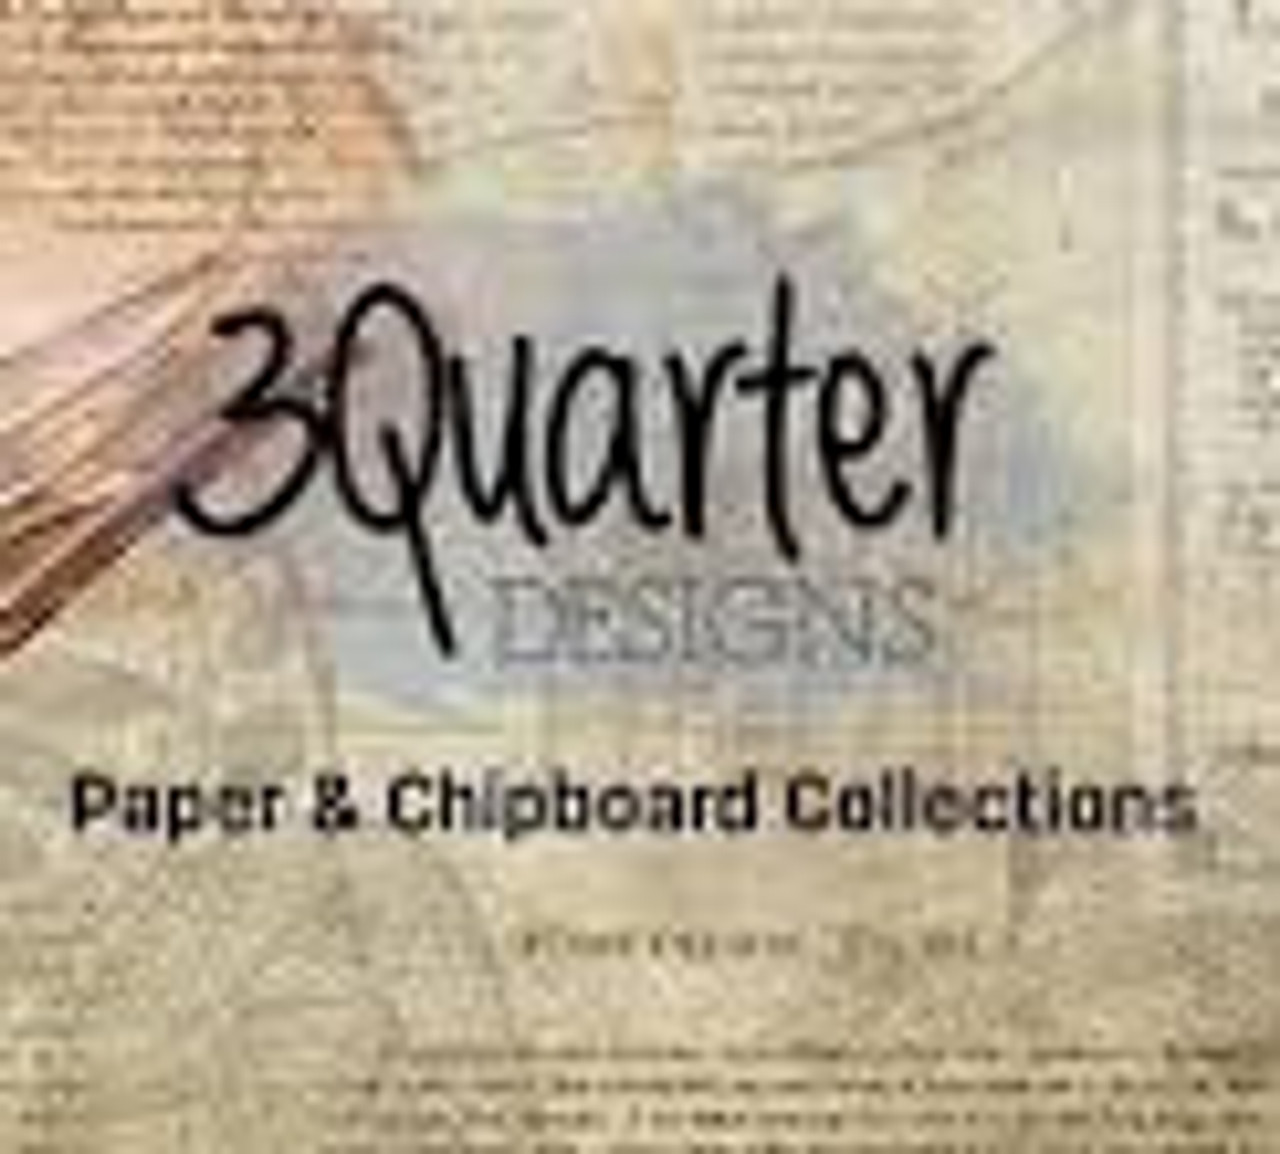 3Quarter Designs